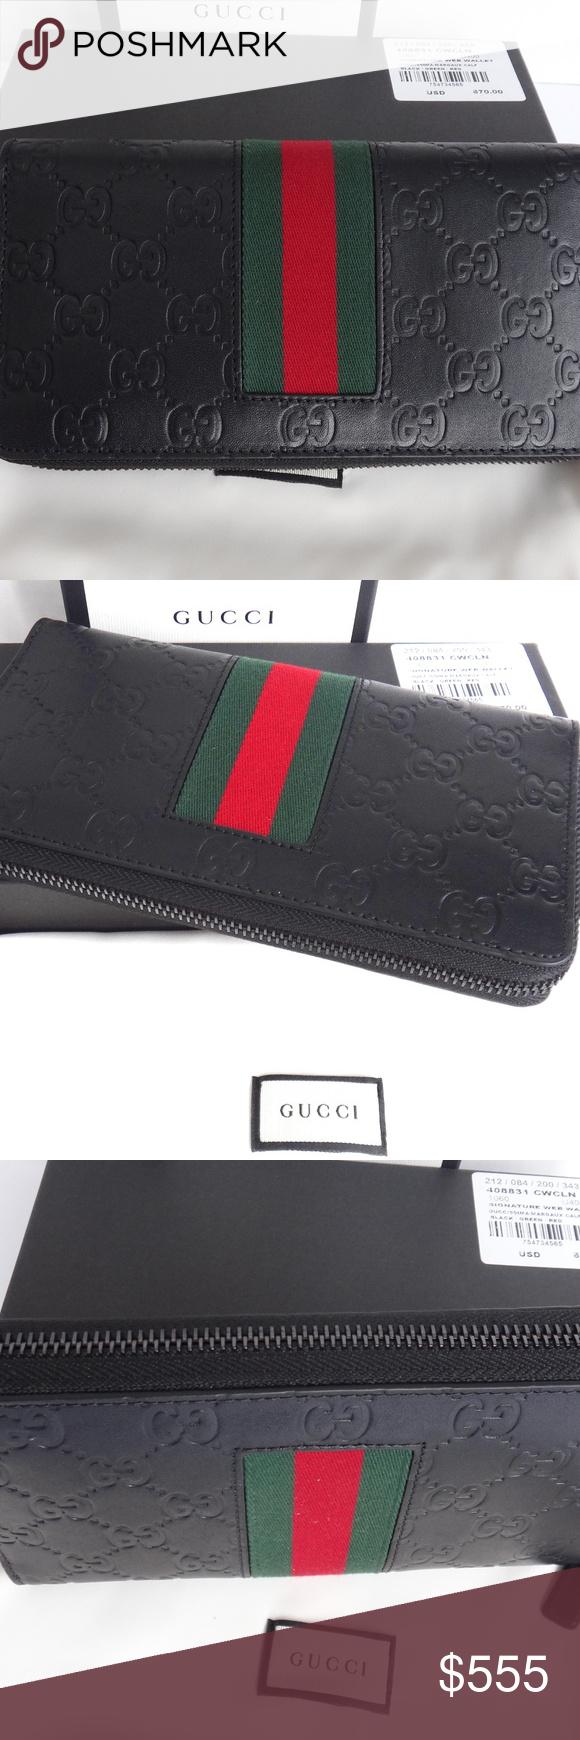 a30a582a4ec Black Leather Gucci Signature Web zip around Long Authentic Mens Black  Gucci signature zip around Long Wallet - Green and Red web - Black leather  trims 12 ...